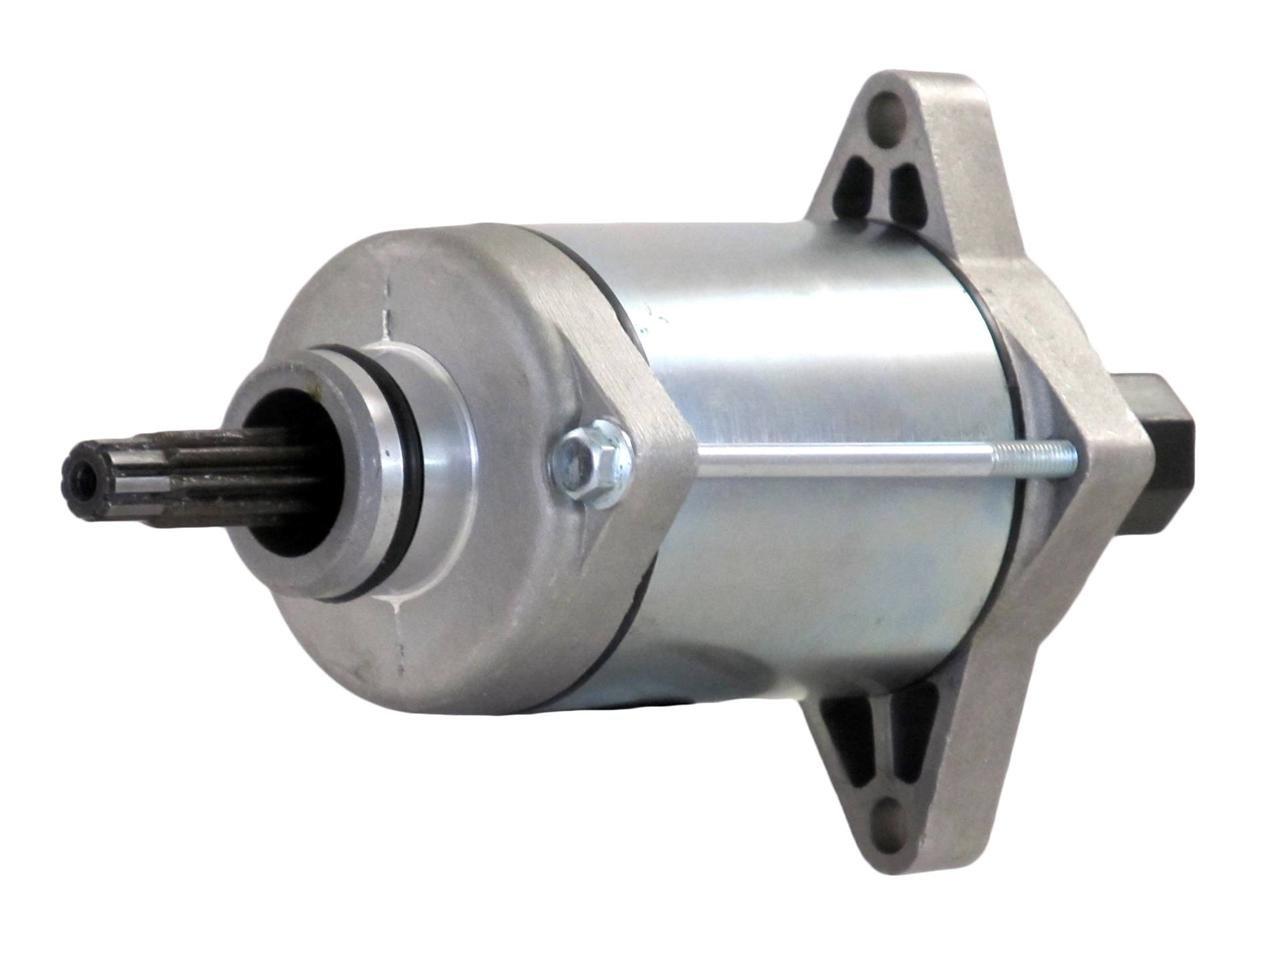 NEW STARTER FITS HONDA 420 TRX420TM FOURTRAX RANCHER 420cc ENGINE 2007-2013 31200-HP5-601 SM18 31200HP5601 31200HR0F01 31200HP5-601